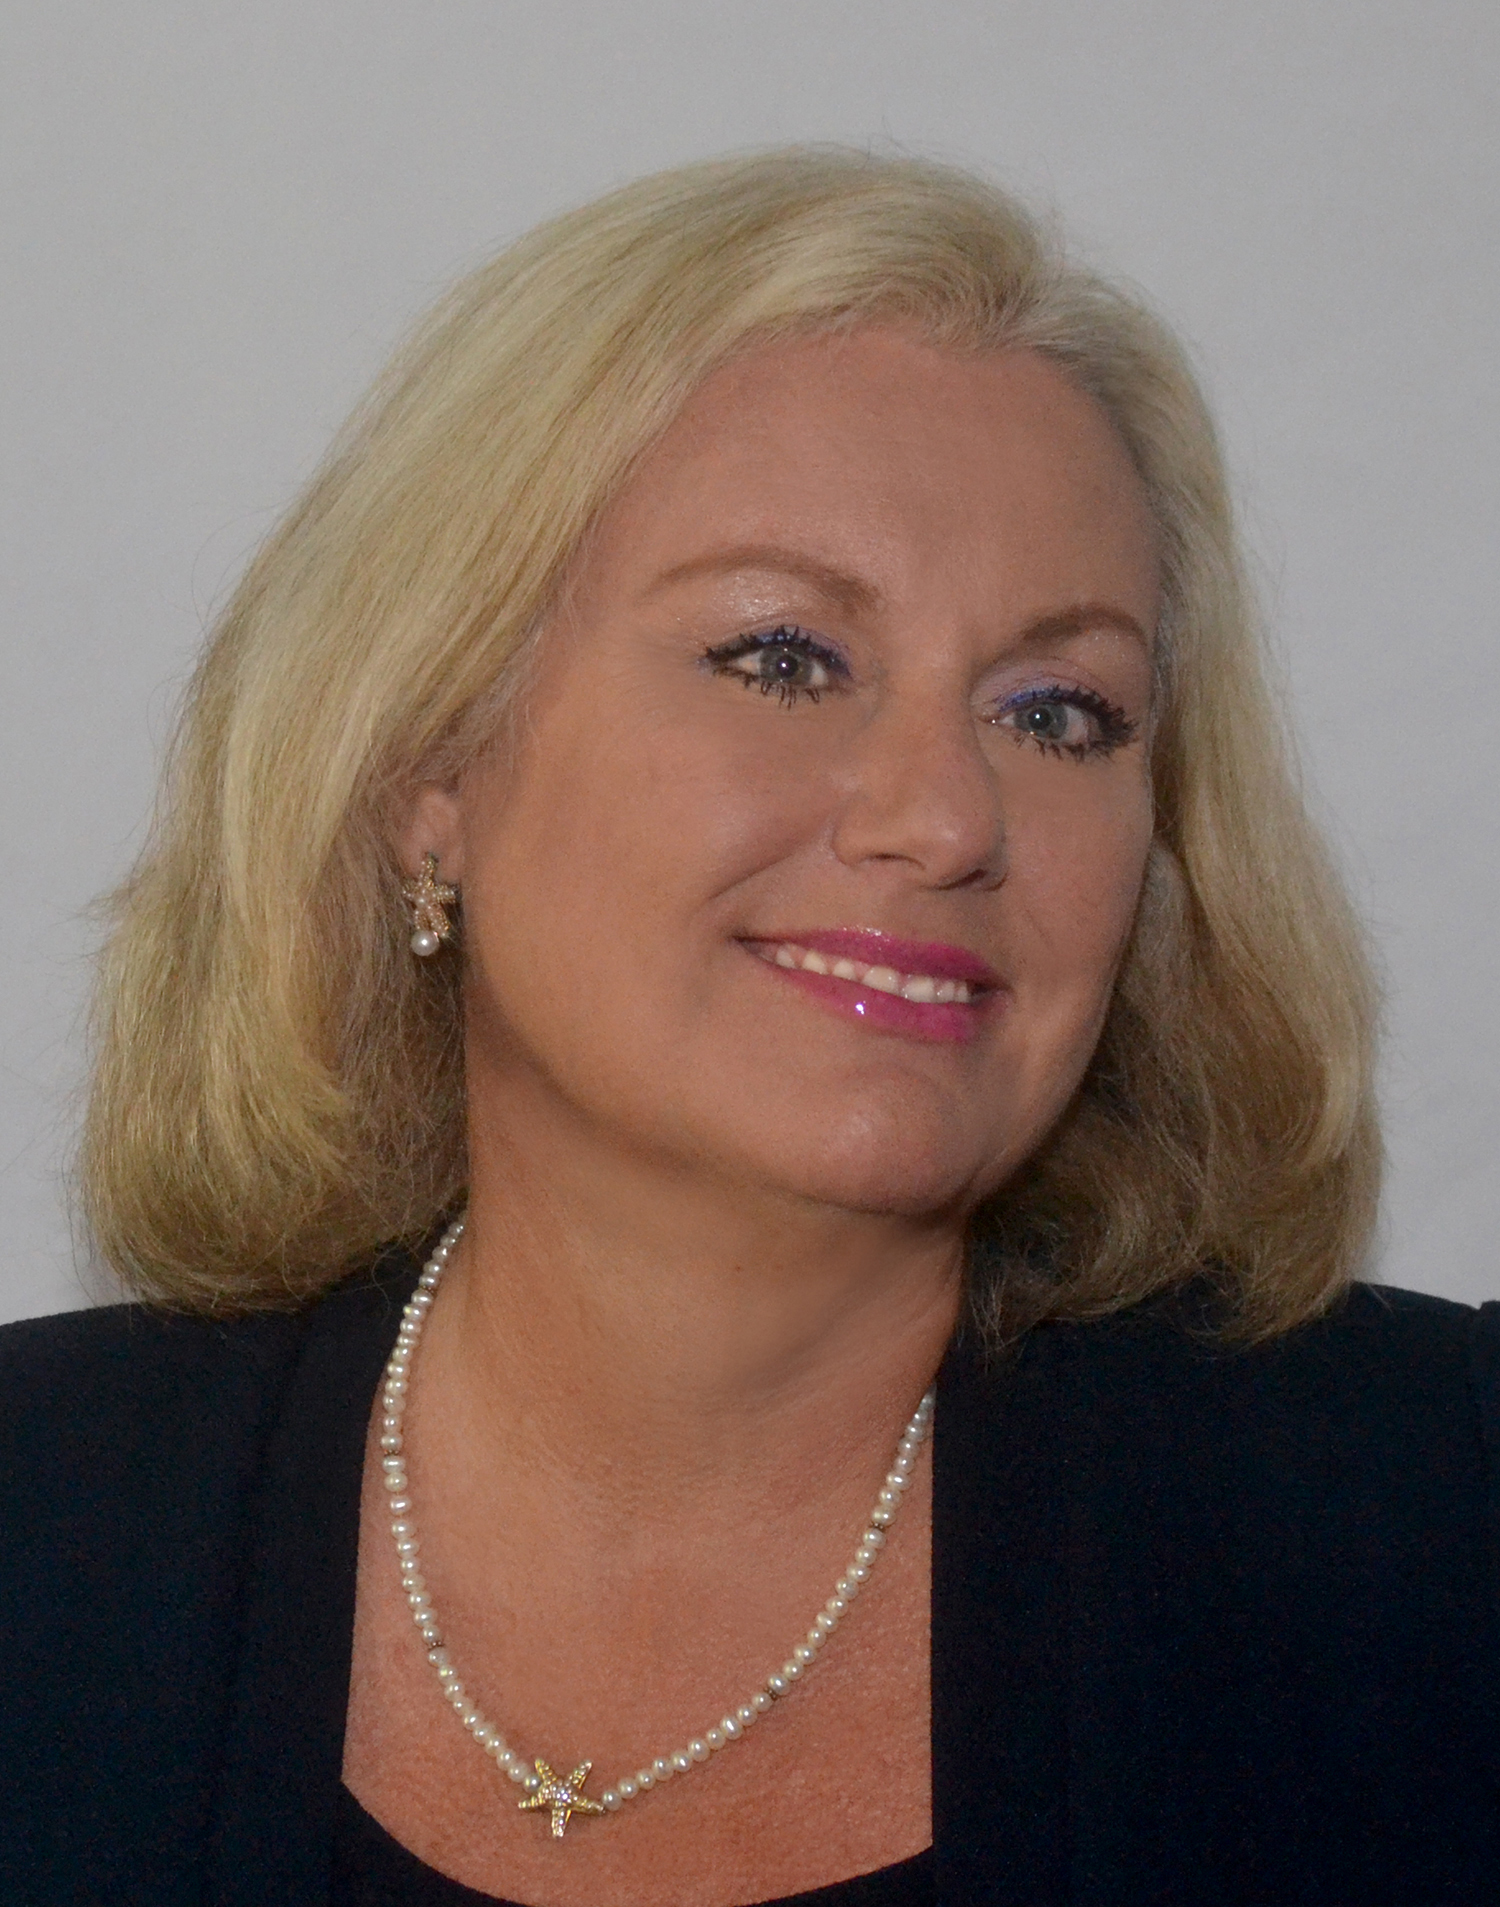 Jessika Arman